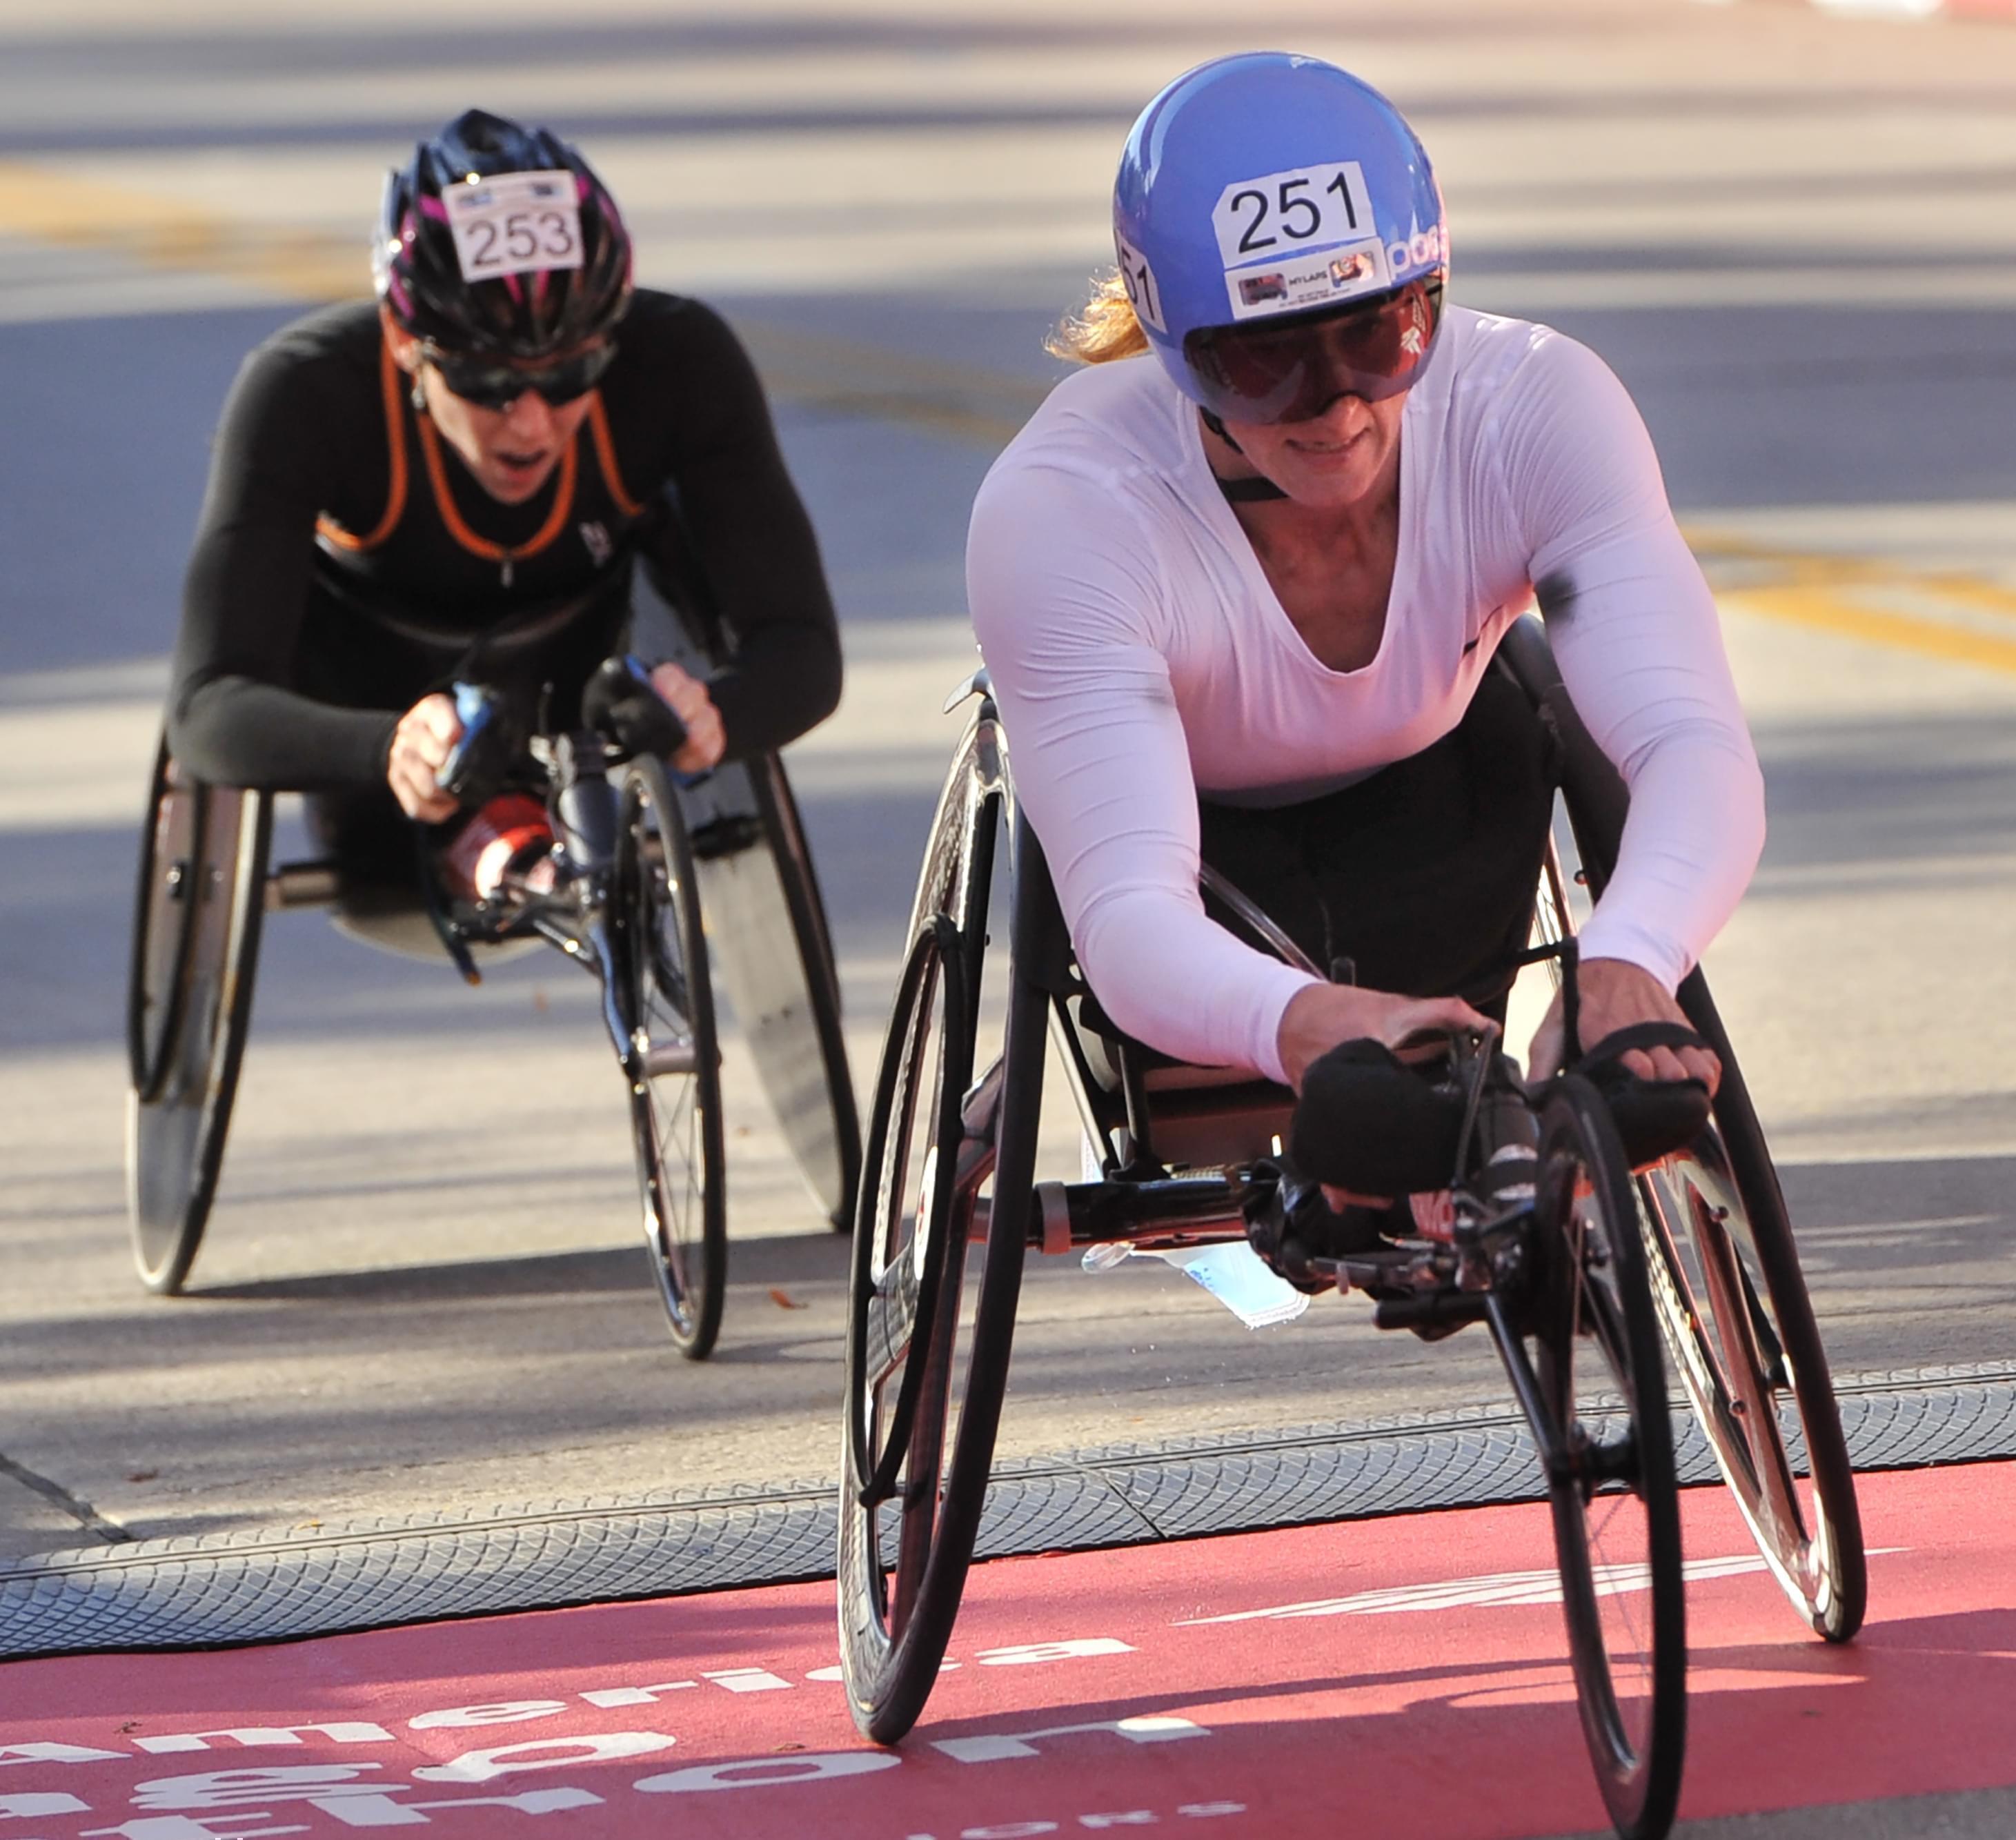 Tatyana McFadden winning the women's wheelchair division of the Chicago Marathon.